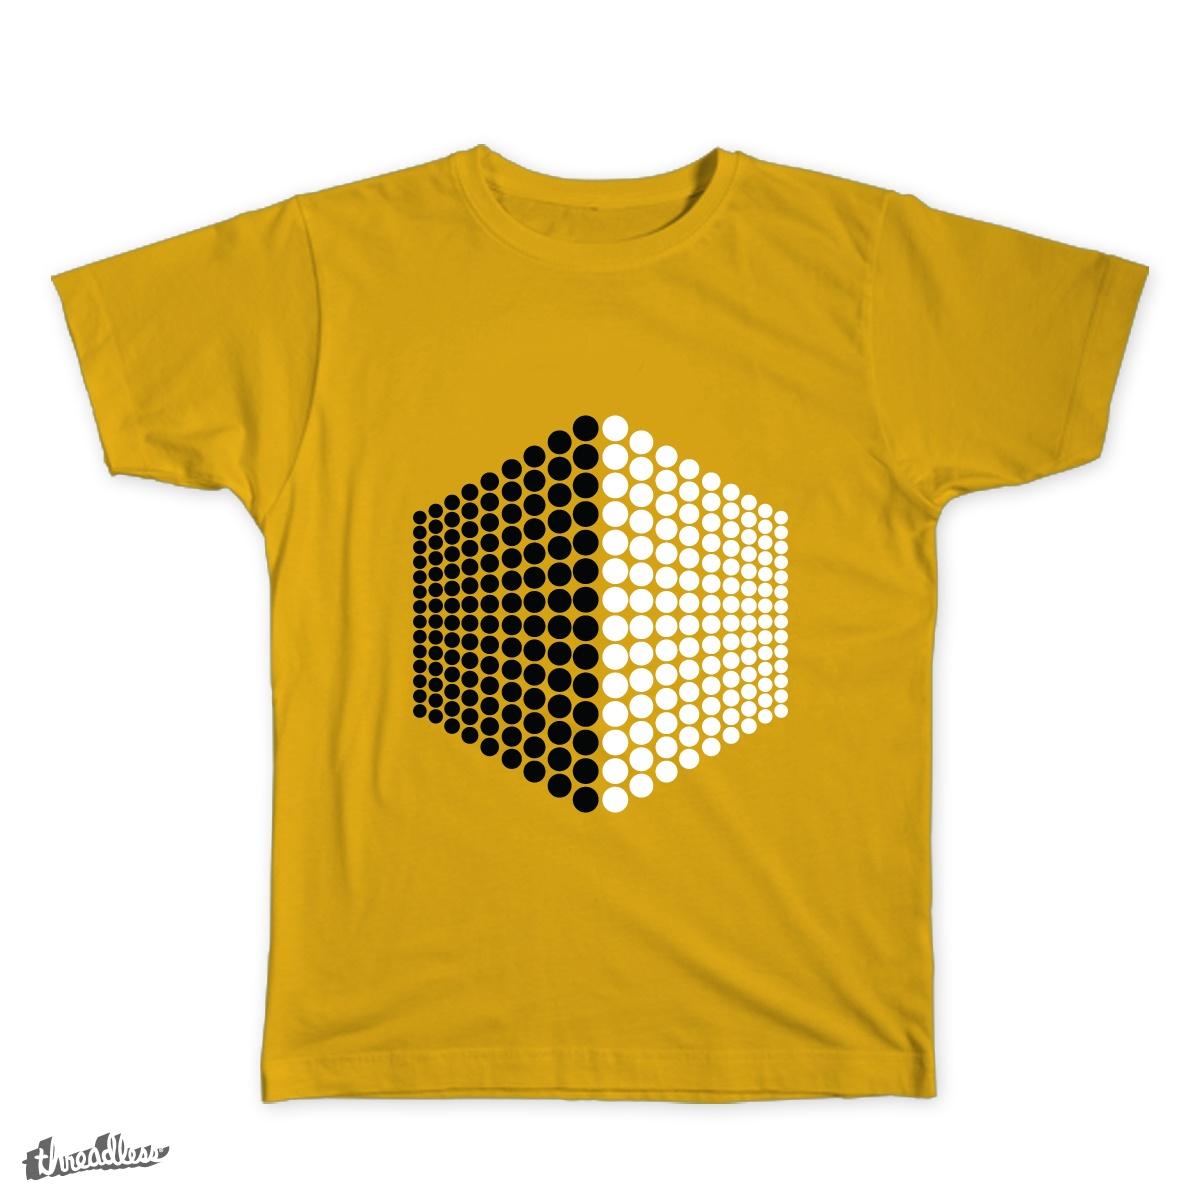 Geometrix 06 by AltiroStudio on Threadless